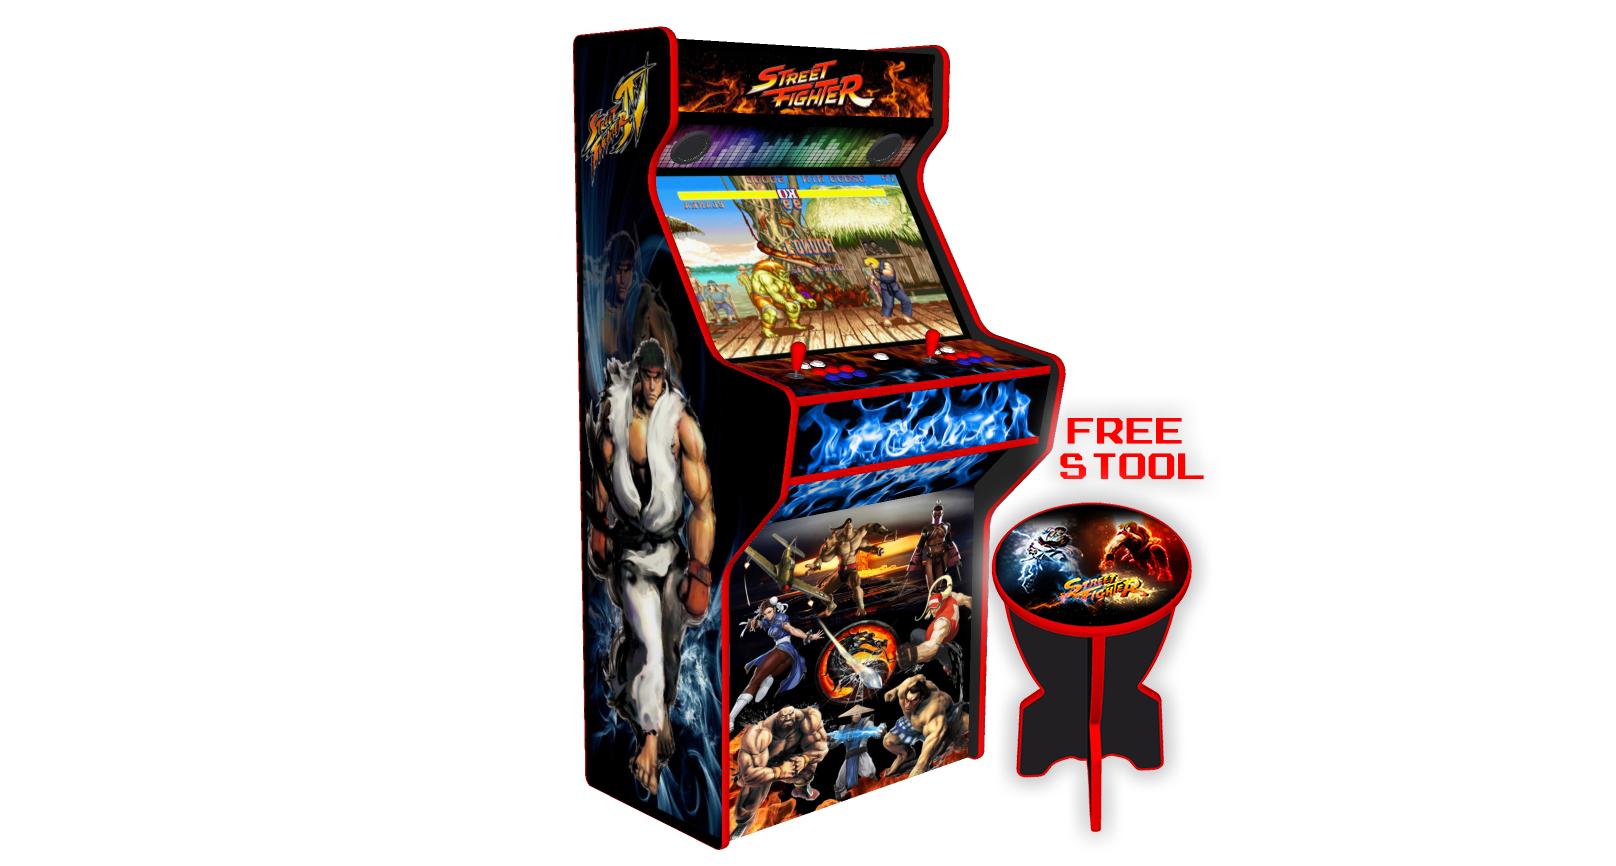 Street Fighter 32 Inch Upright Arcade Machine - American Style Joysticks - Red Tmold - Left